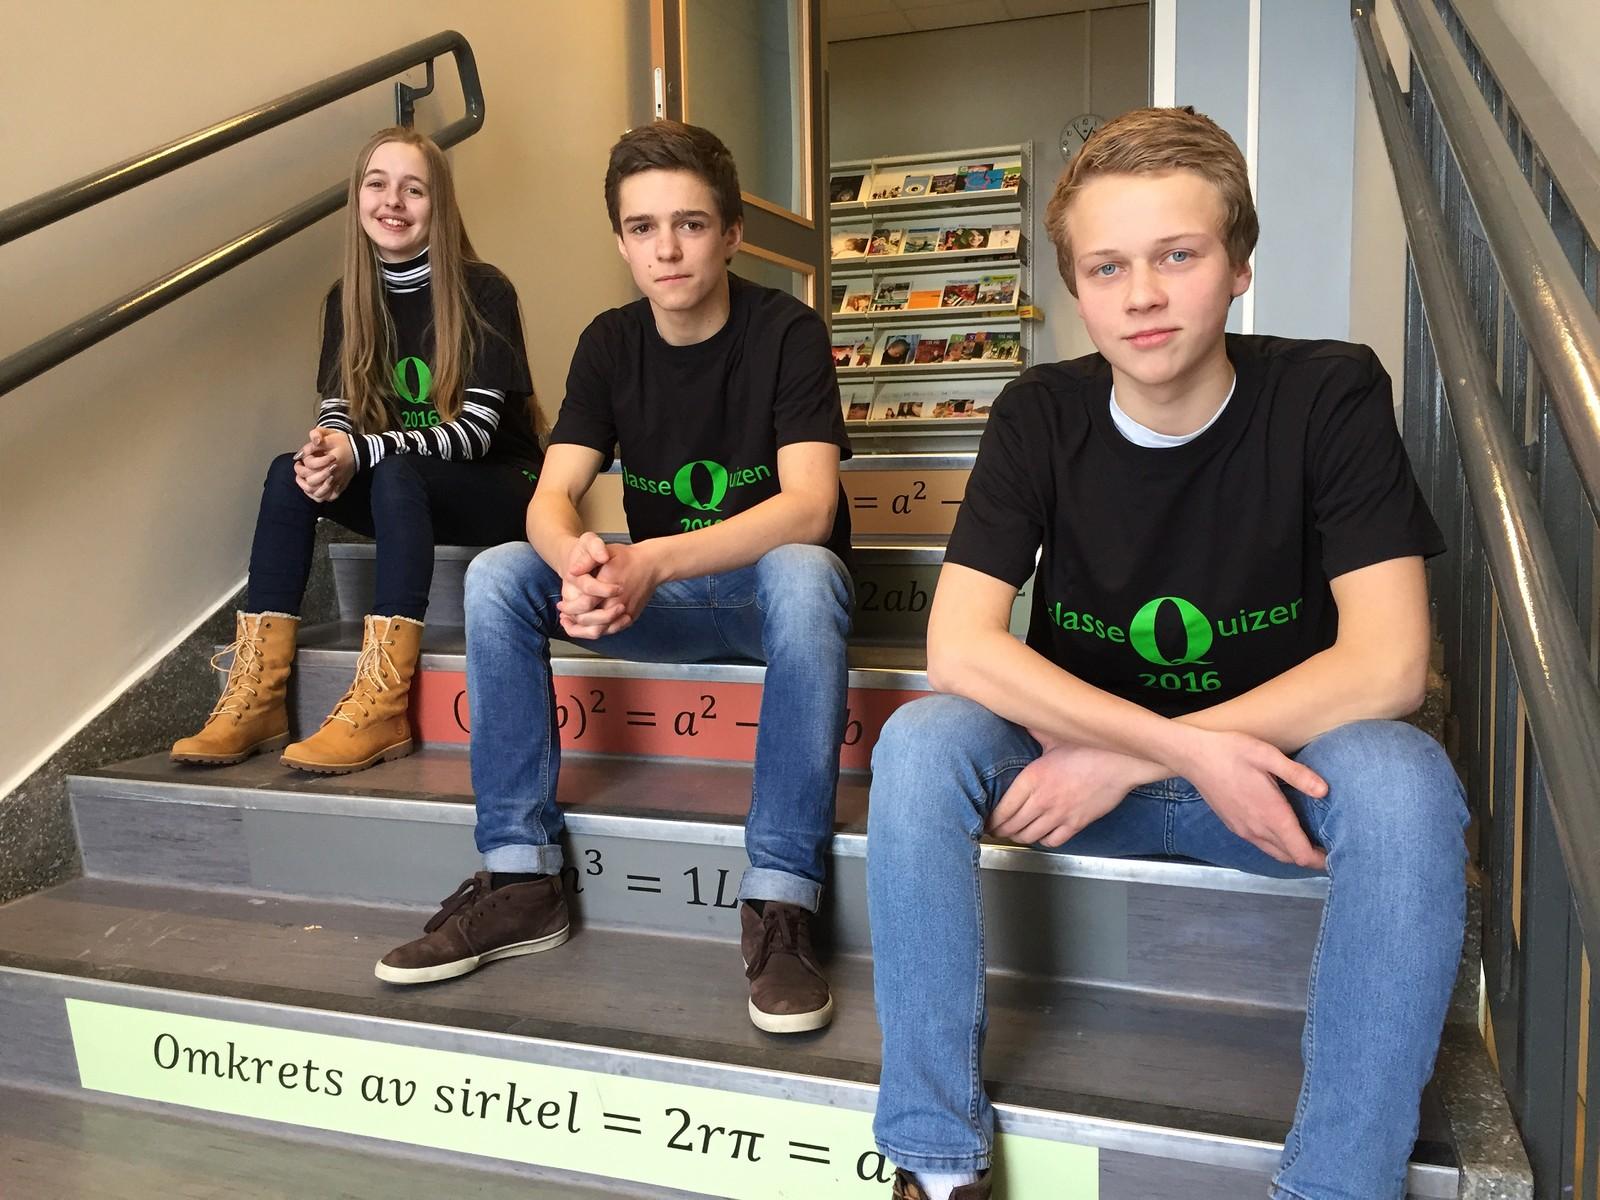 Selma Jakupovic, Erik Fodstad og Amund Møllerhagen ved Lena ungdomsskole fikk sju poeng.